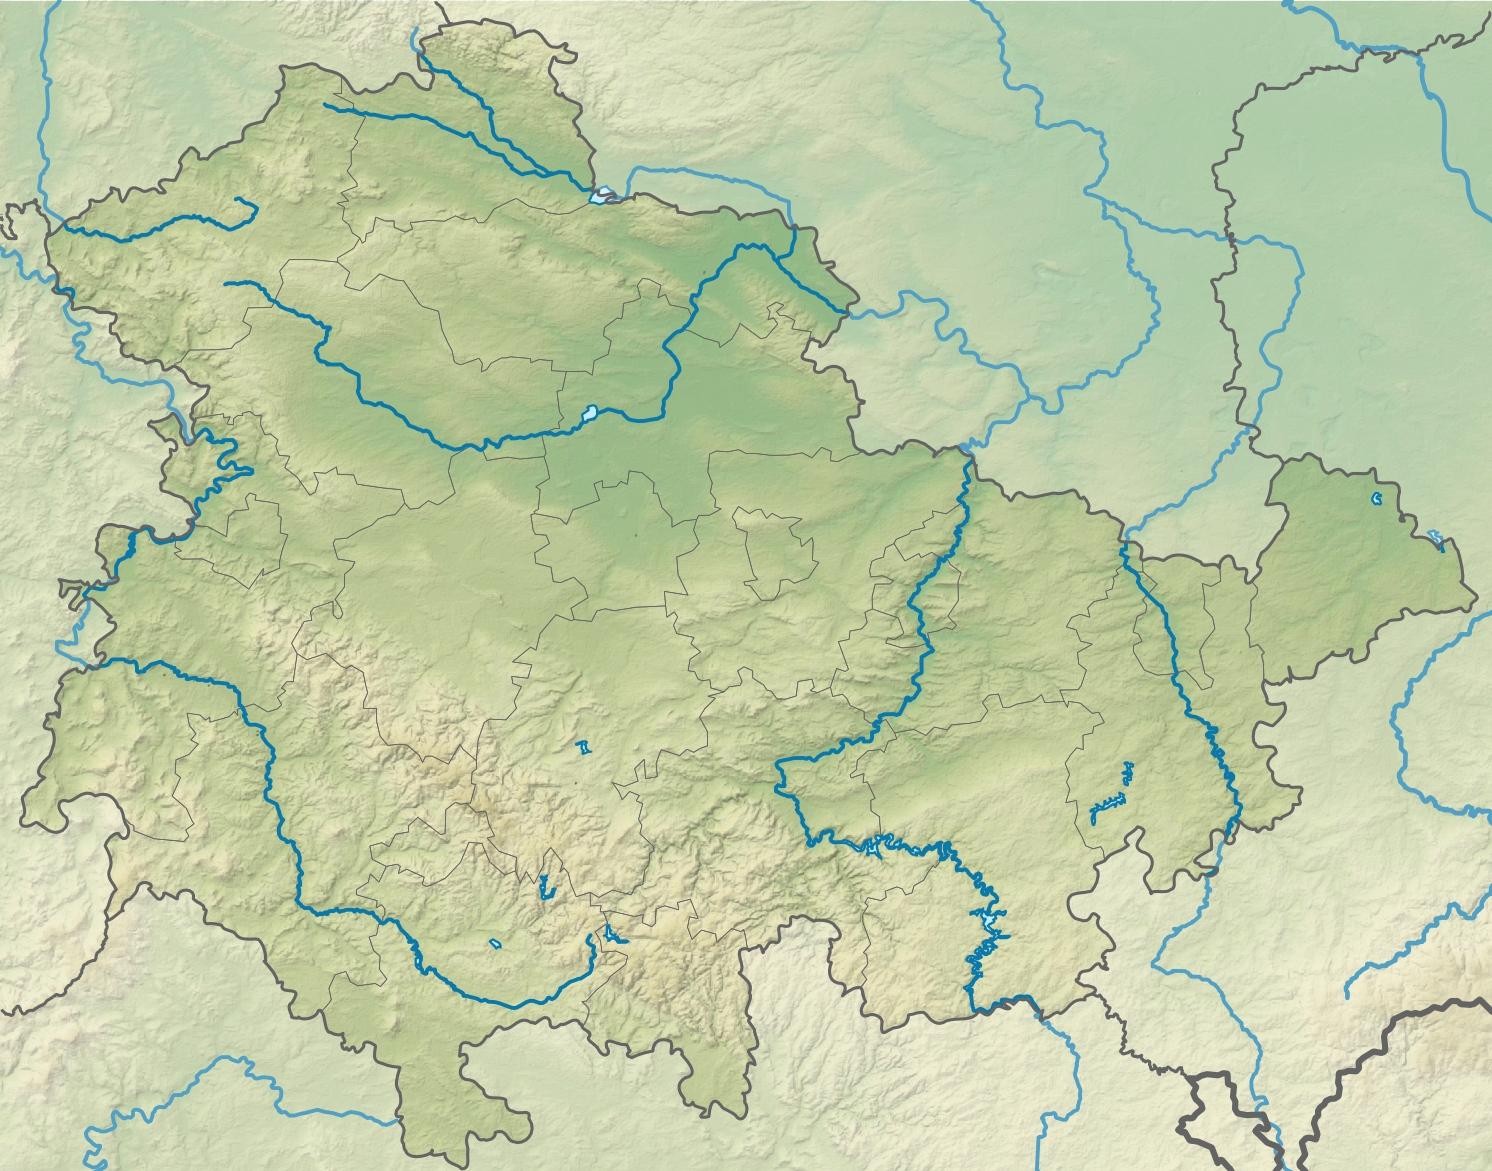 Naher Osten Karte Ohne Beschriftung.Nordthüringer Hügelland Wikipedia